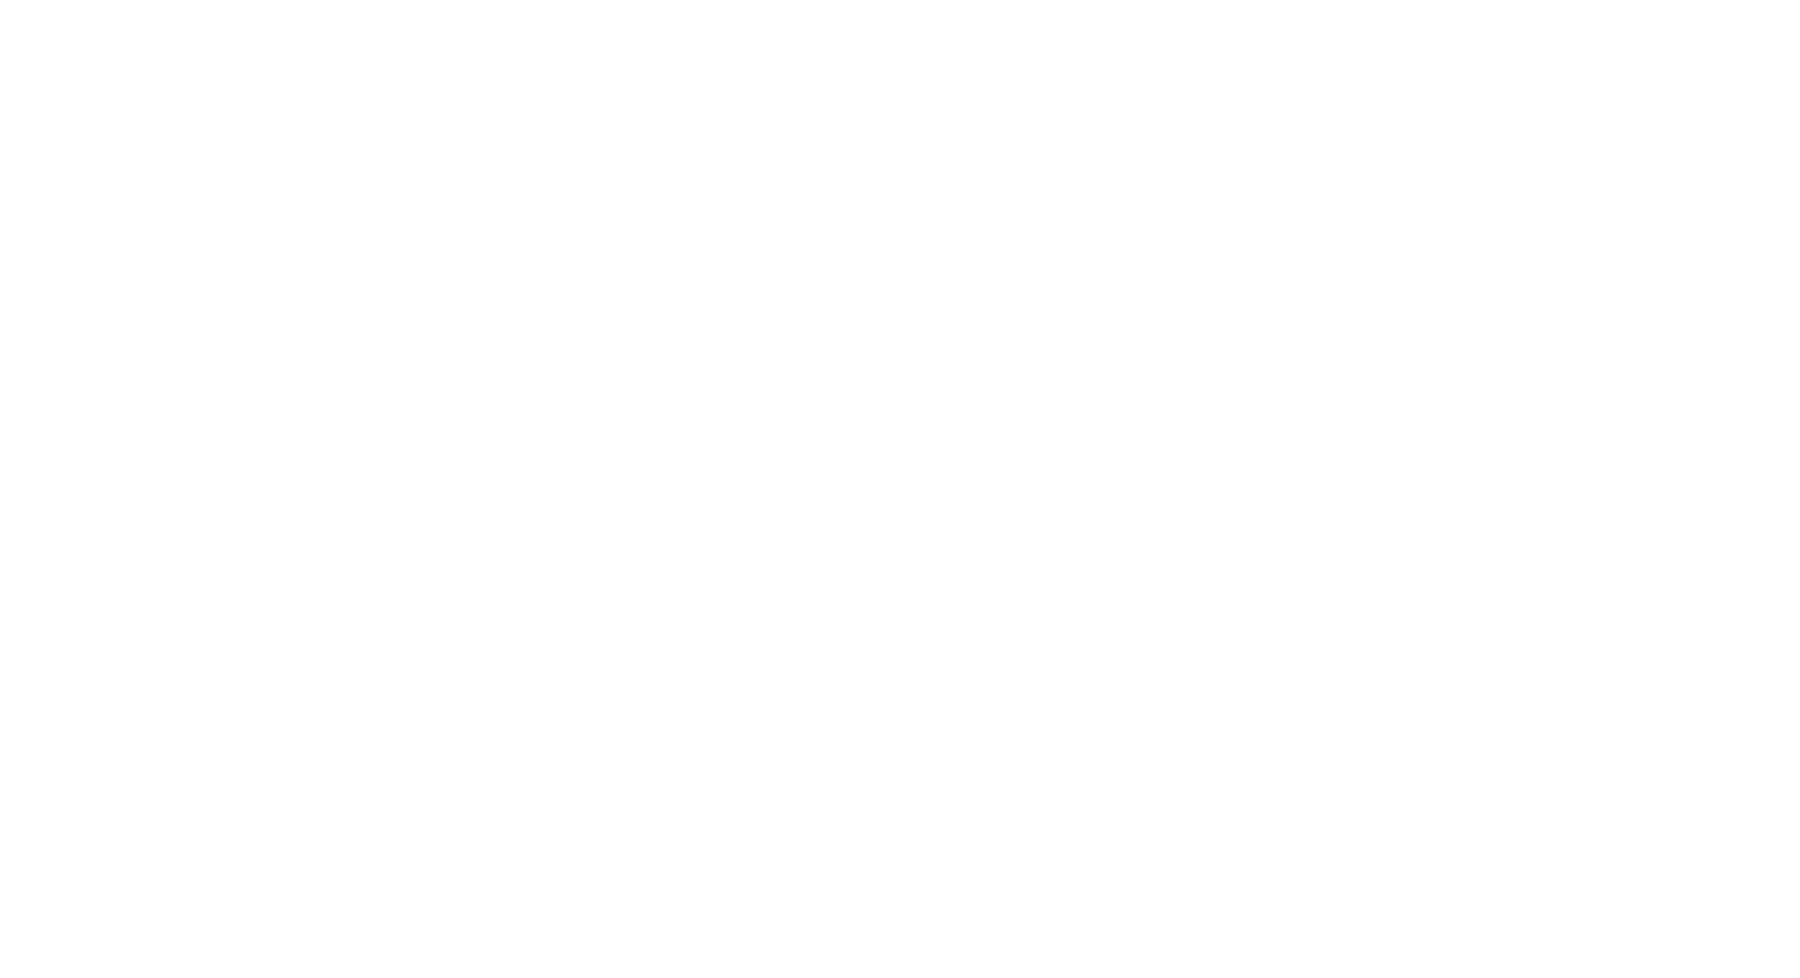 http://smc.com.mx/wp-content/uploads/2018/01/SMC-Slogan-Blanco-1.png